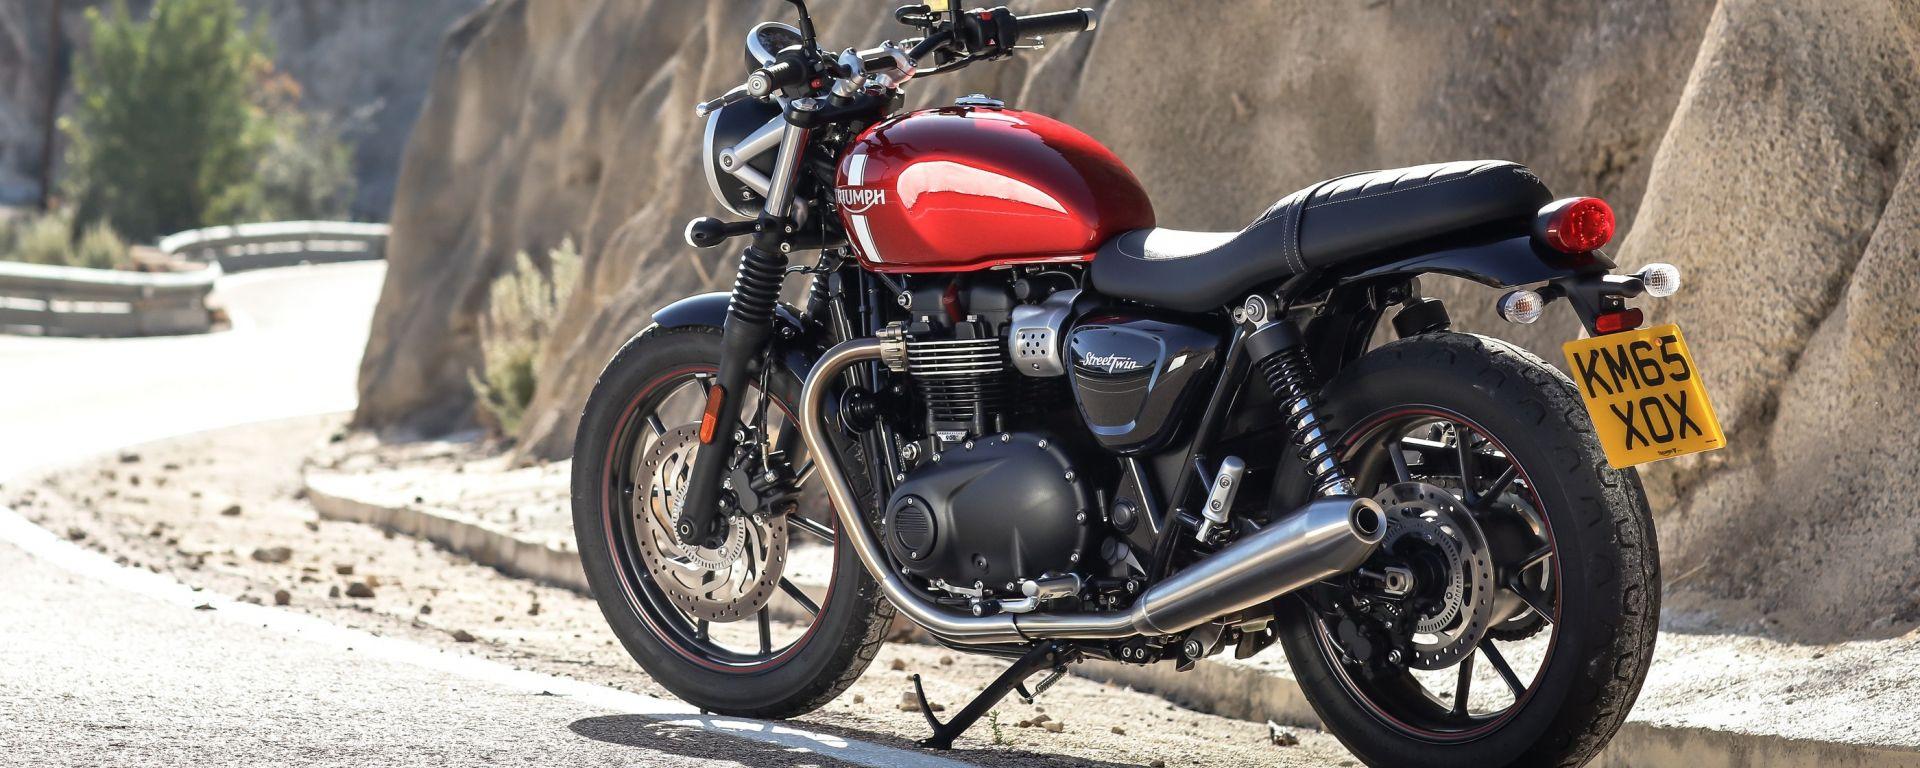 Triumph a Motodays 2016